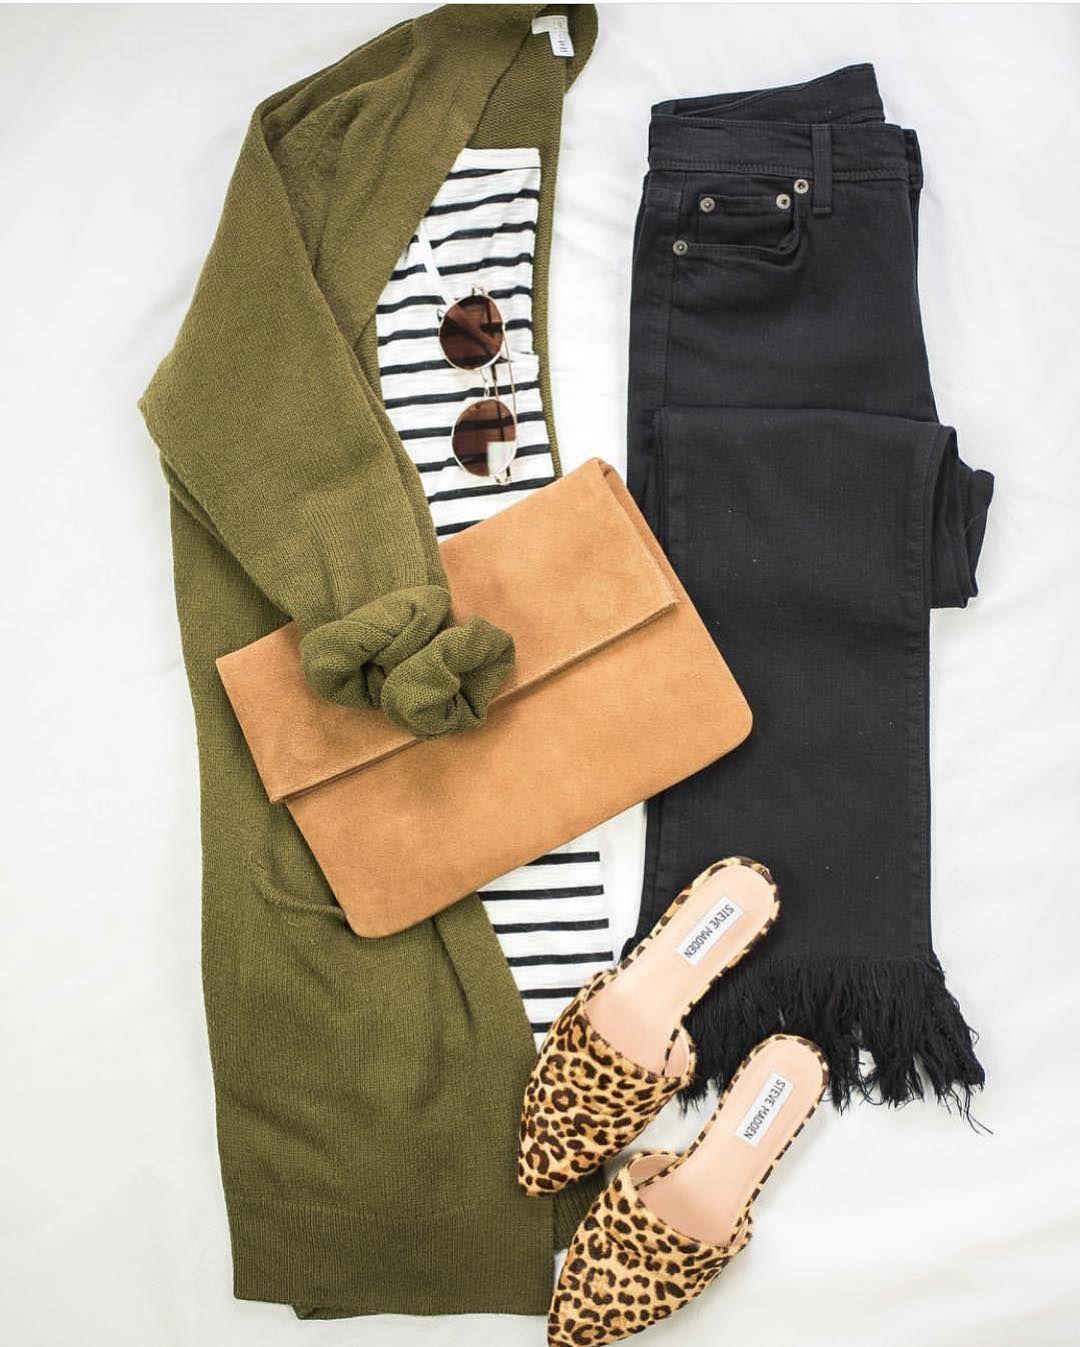 Olive green cardigan, black striped t-shirt, change to black skinny jeans, leopa…